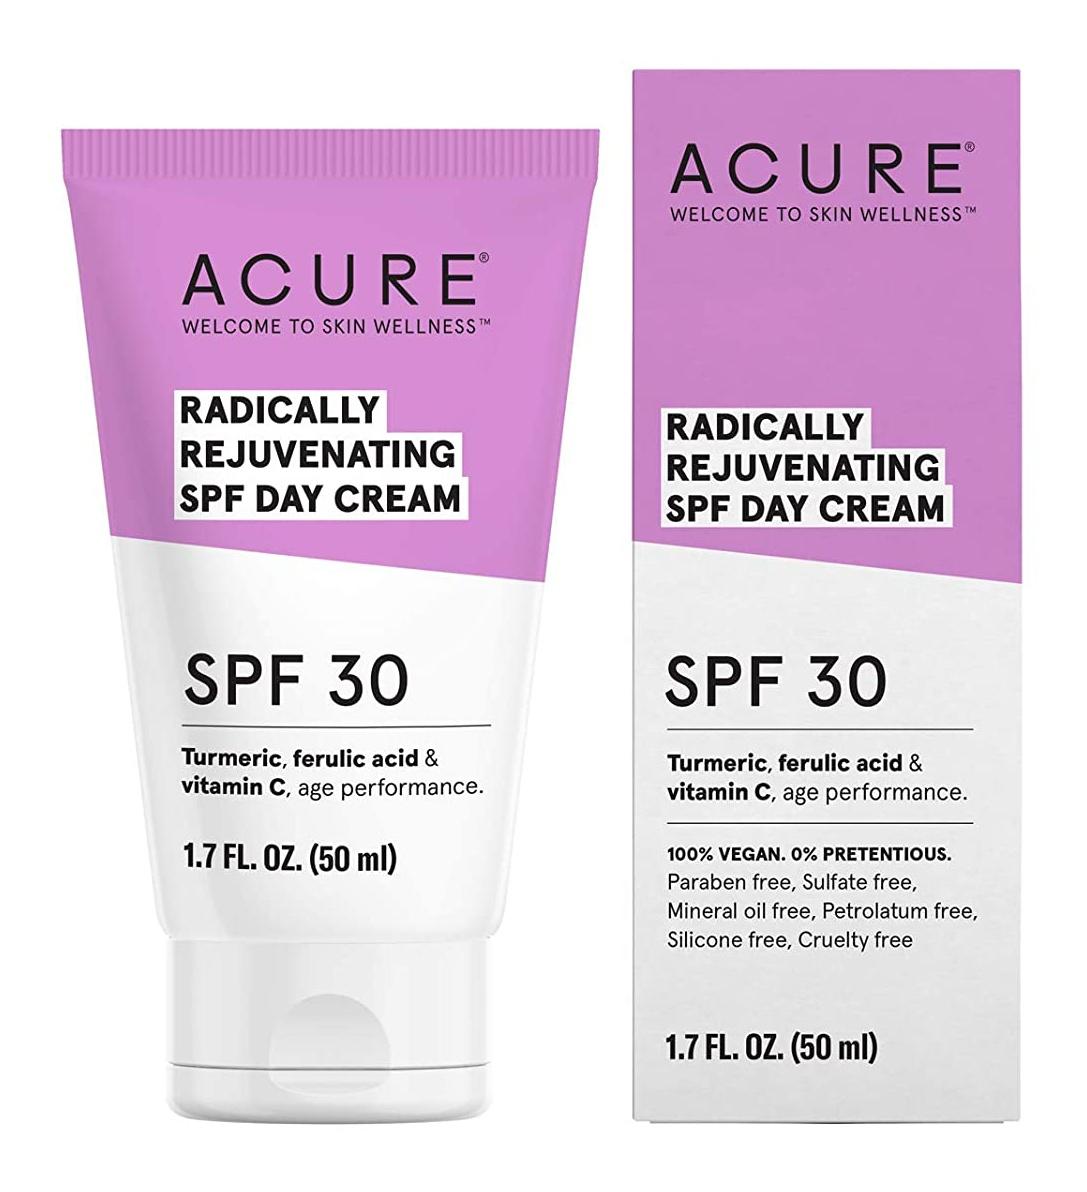 Acure Radically Rejuvenating SPF Day Cream